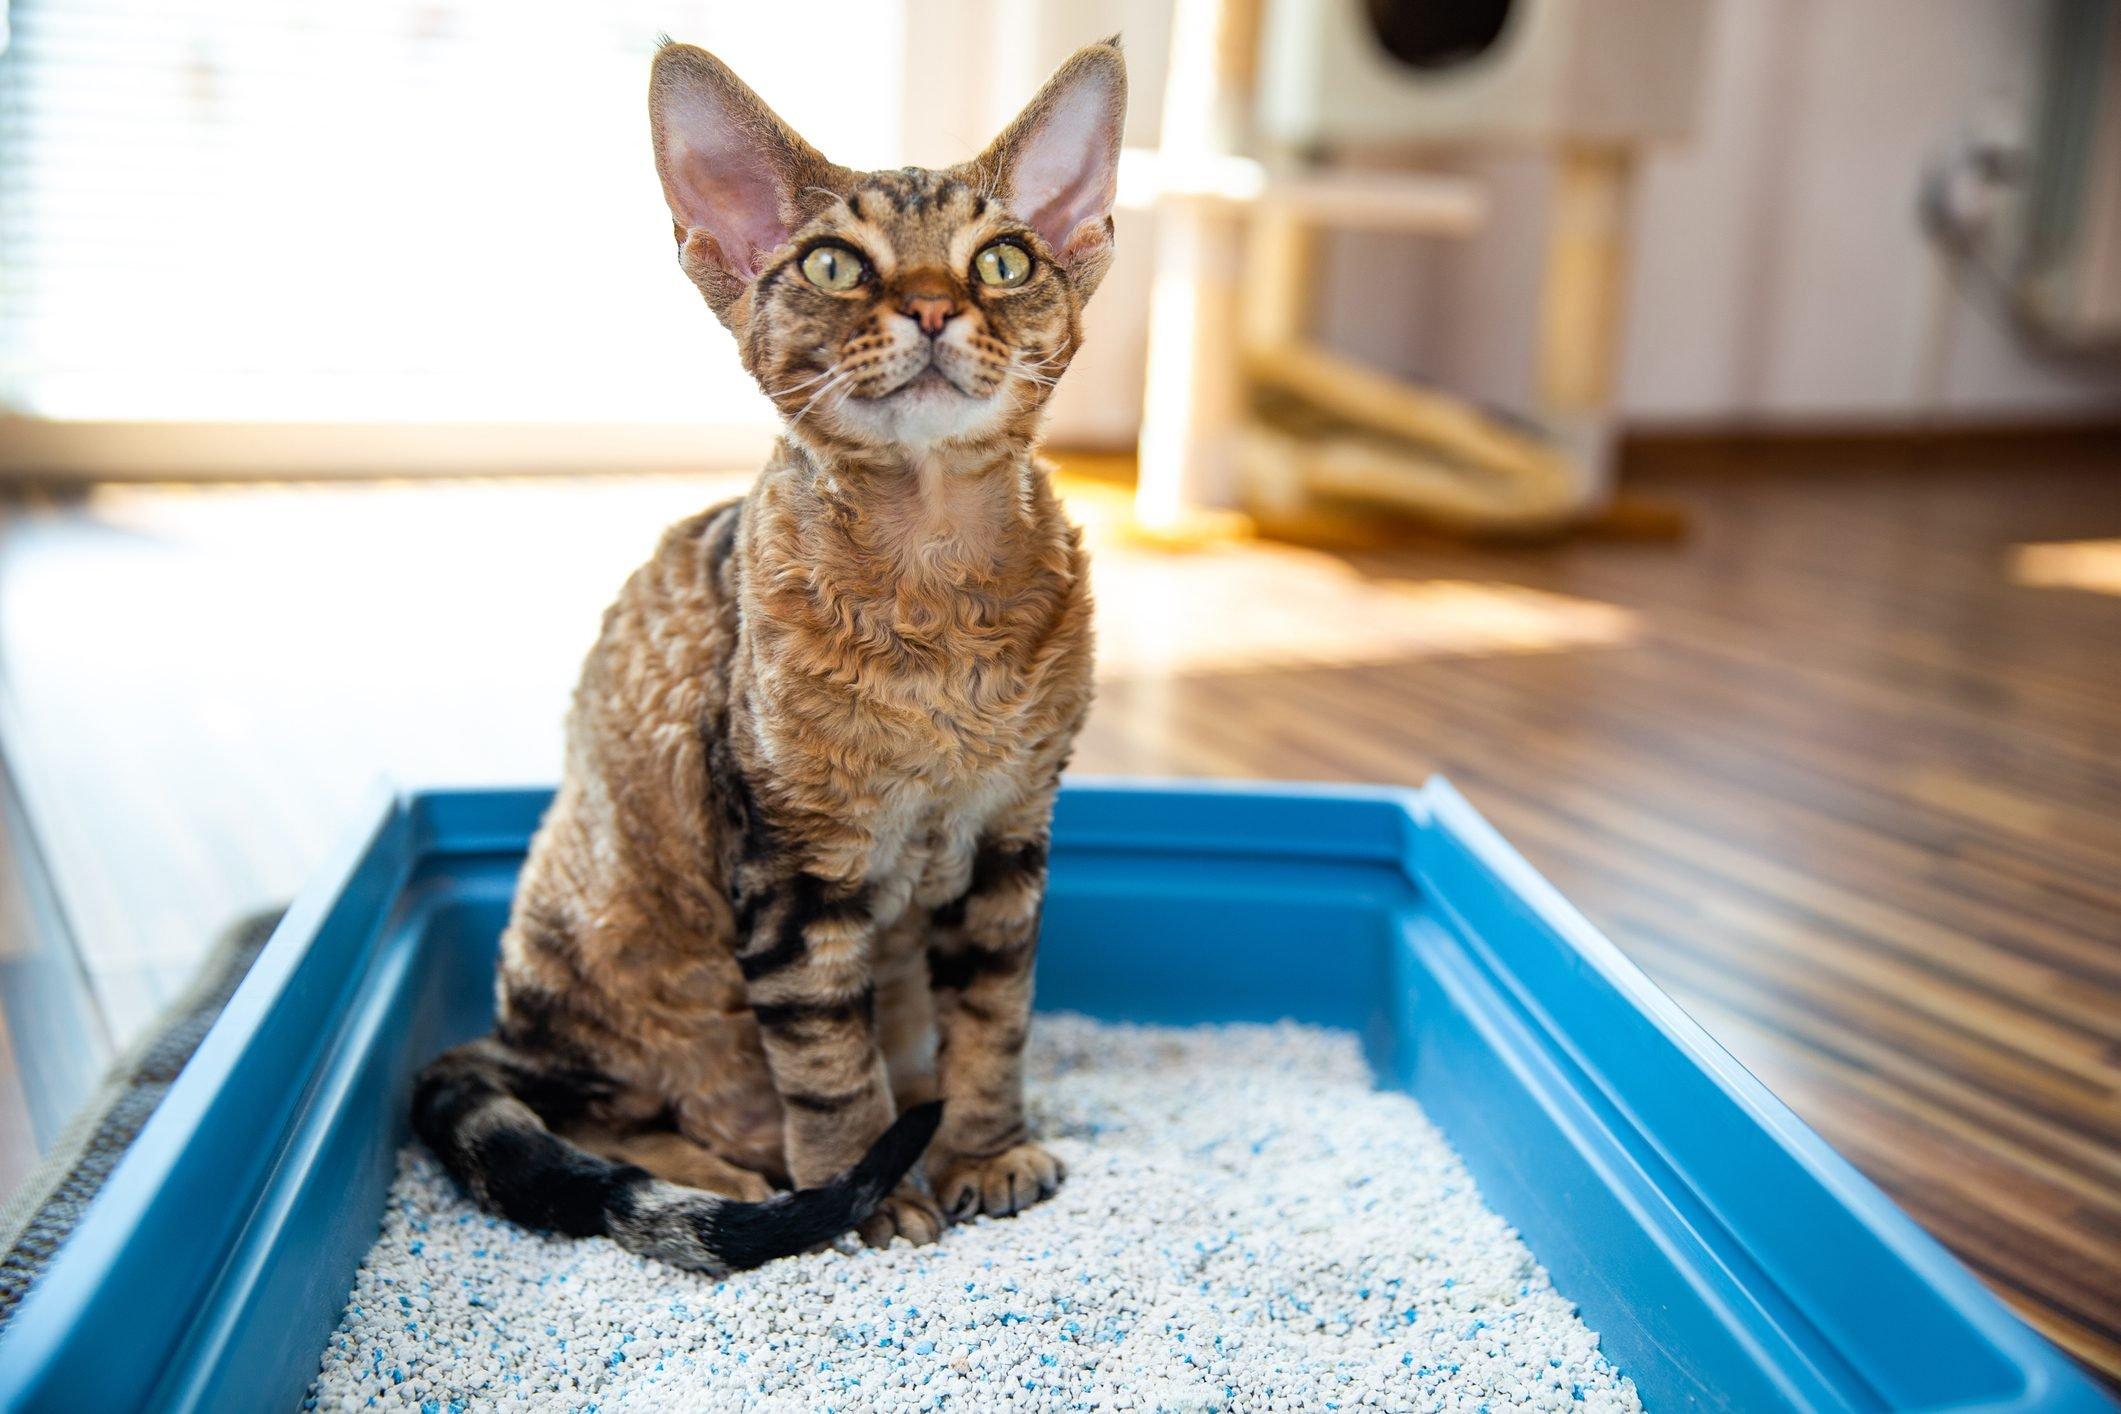 Obedient Devon Rex Cat Sitting in Litter Box in Living Room - stock photo